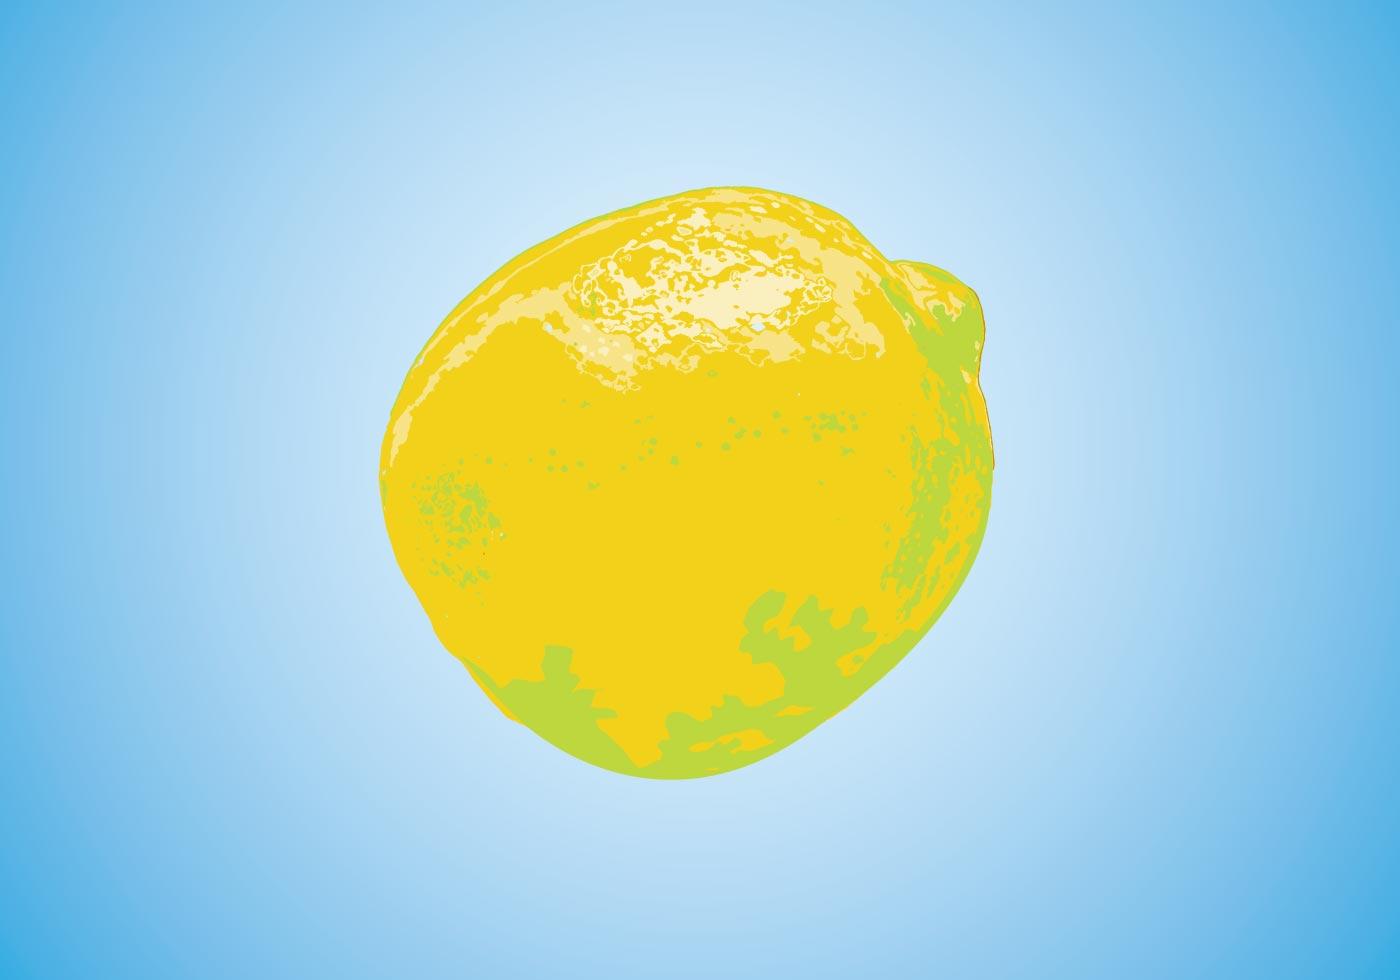 lemon vector free download - photo #20